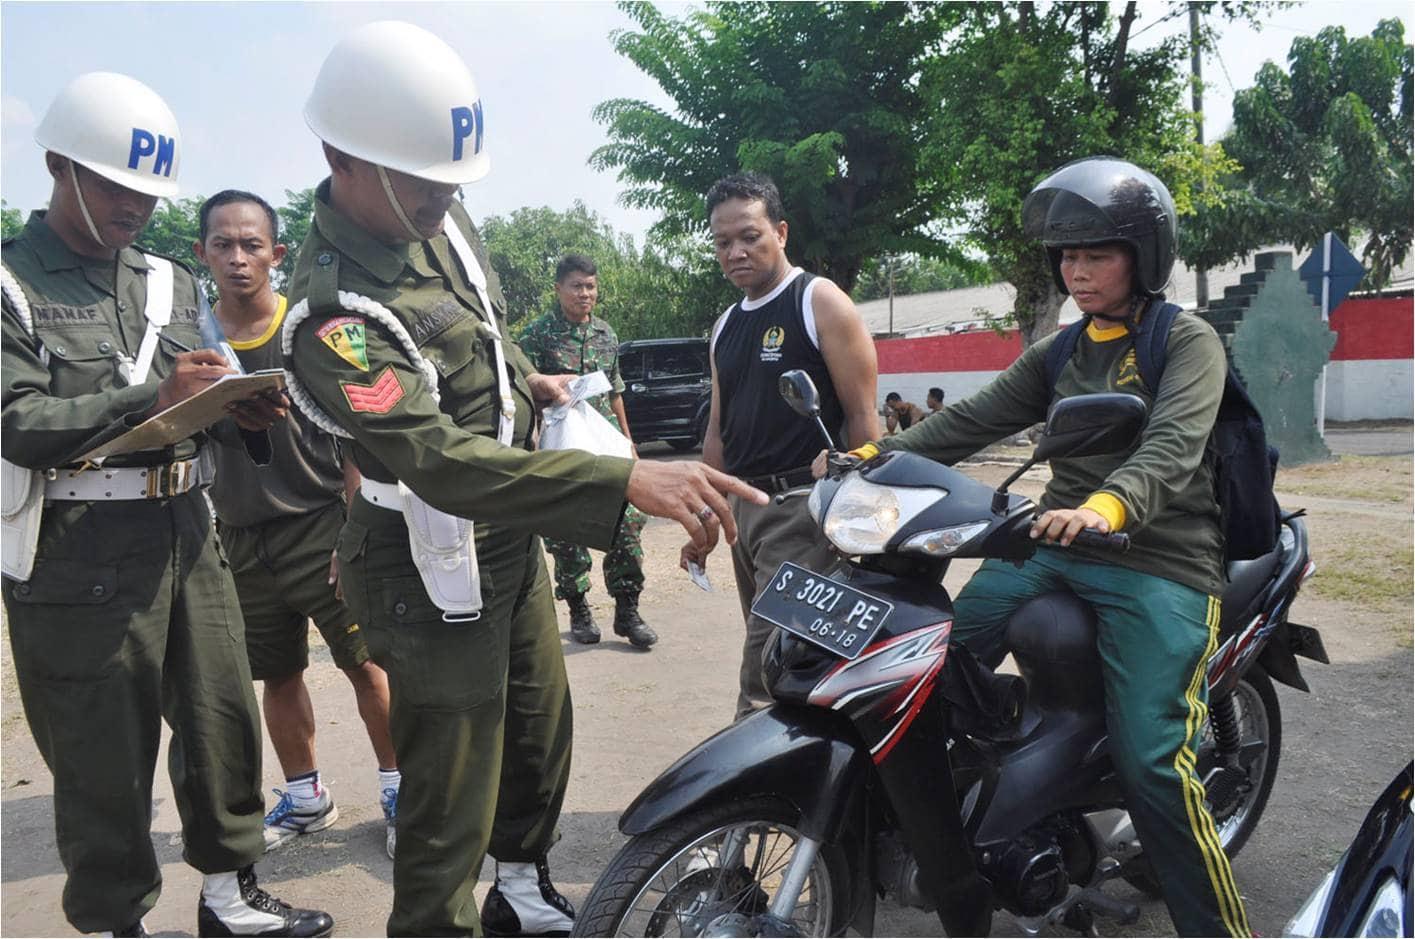 3. Anggota Denpom Mojokerto memeriksa kelengkapan kendaraan anggota Korem 082